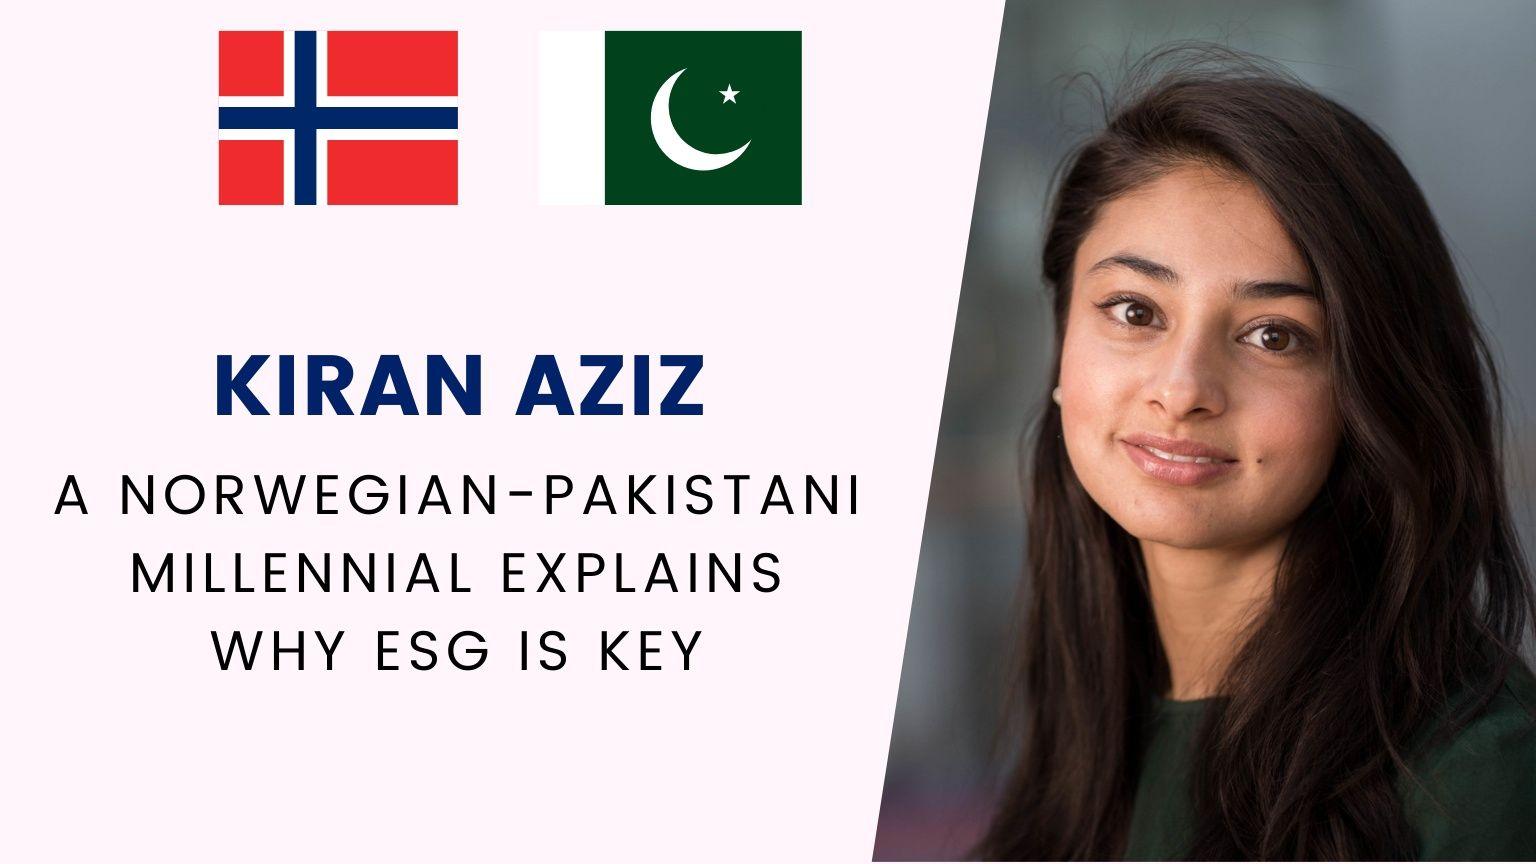 Kiran Aziz A Norwegian-Pakistani millennial explains why ESG is key